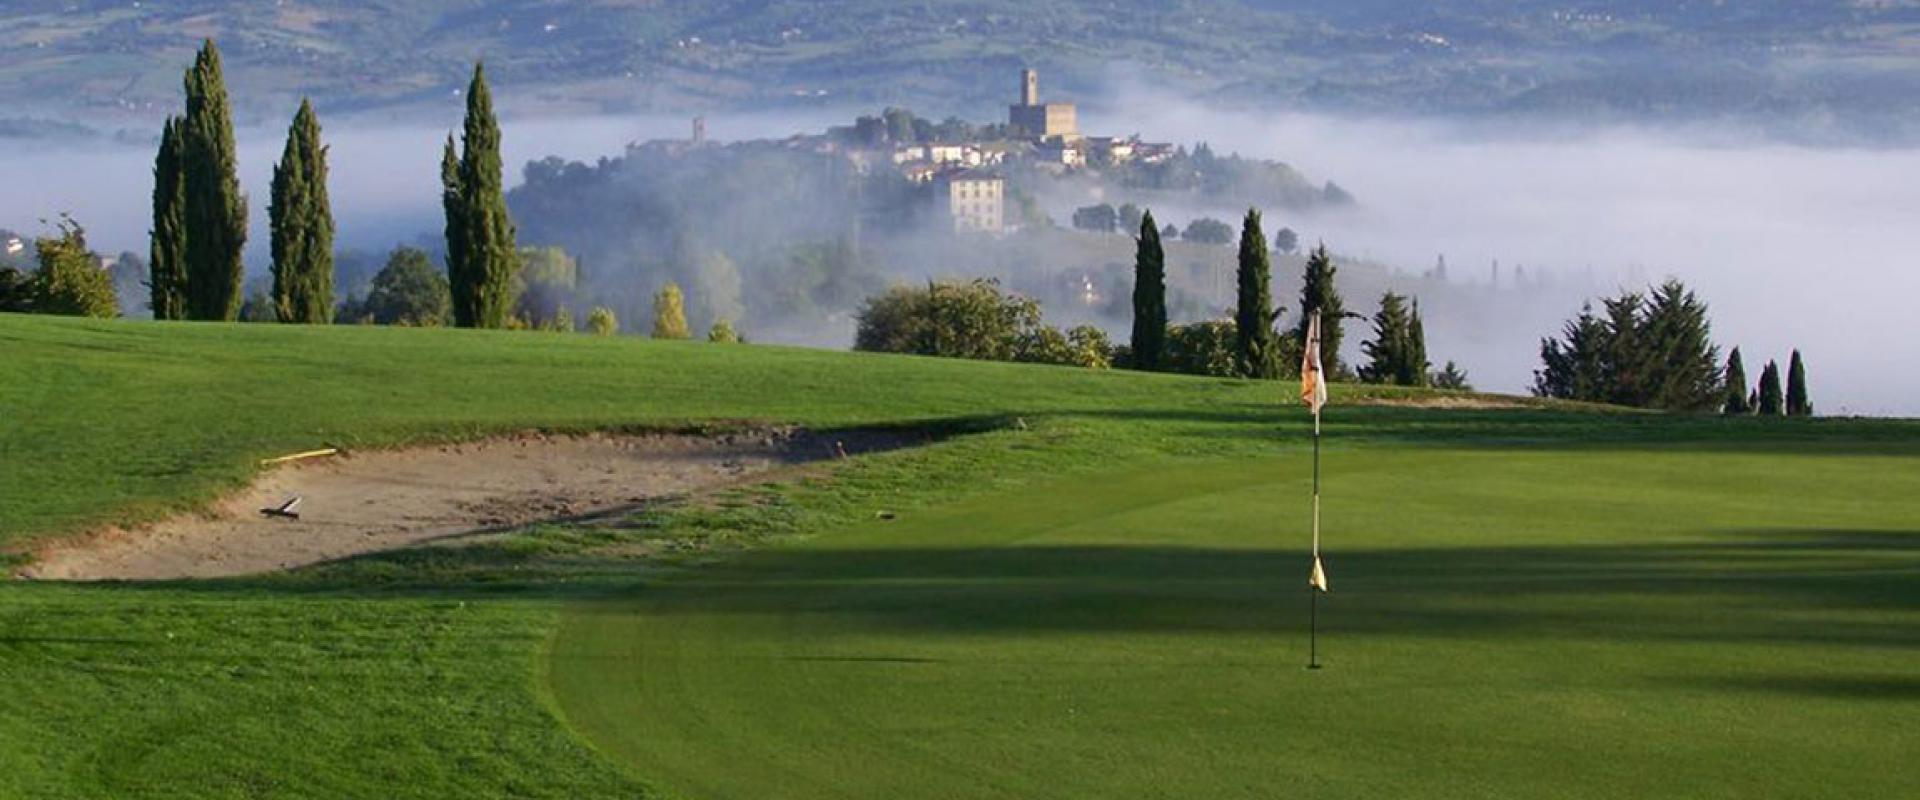 golf in casentino